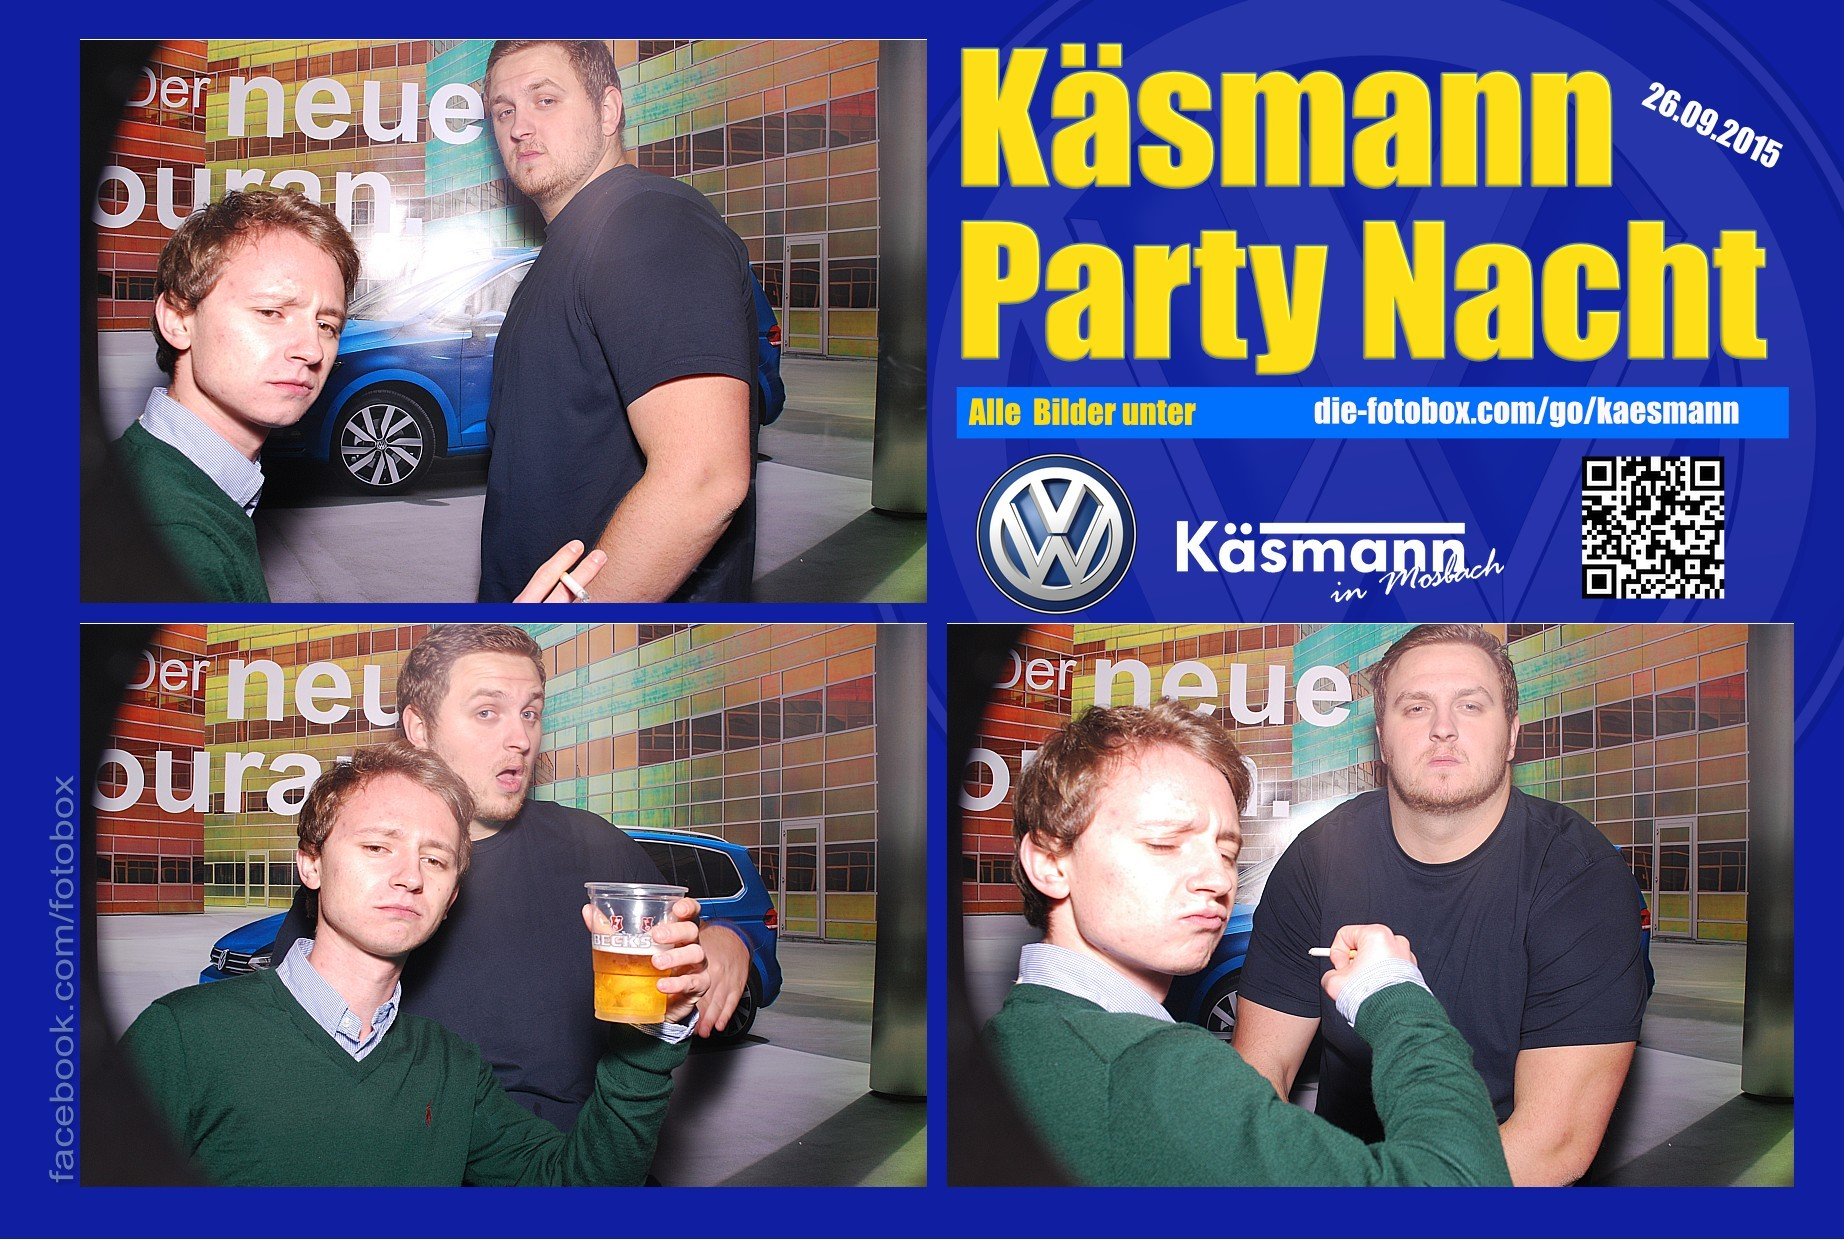 Käsmannparty 2015 - www.die-fotobox.com 01152